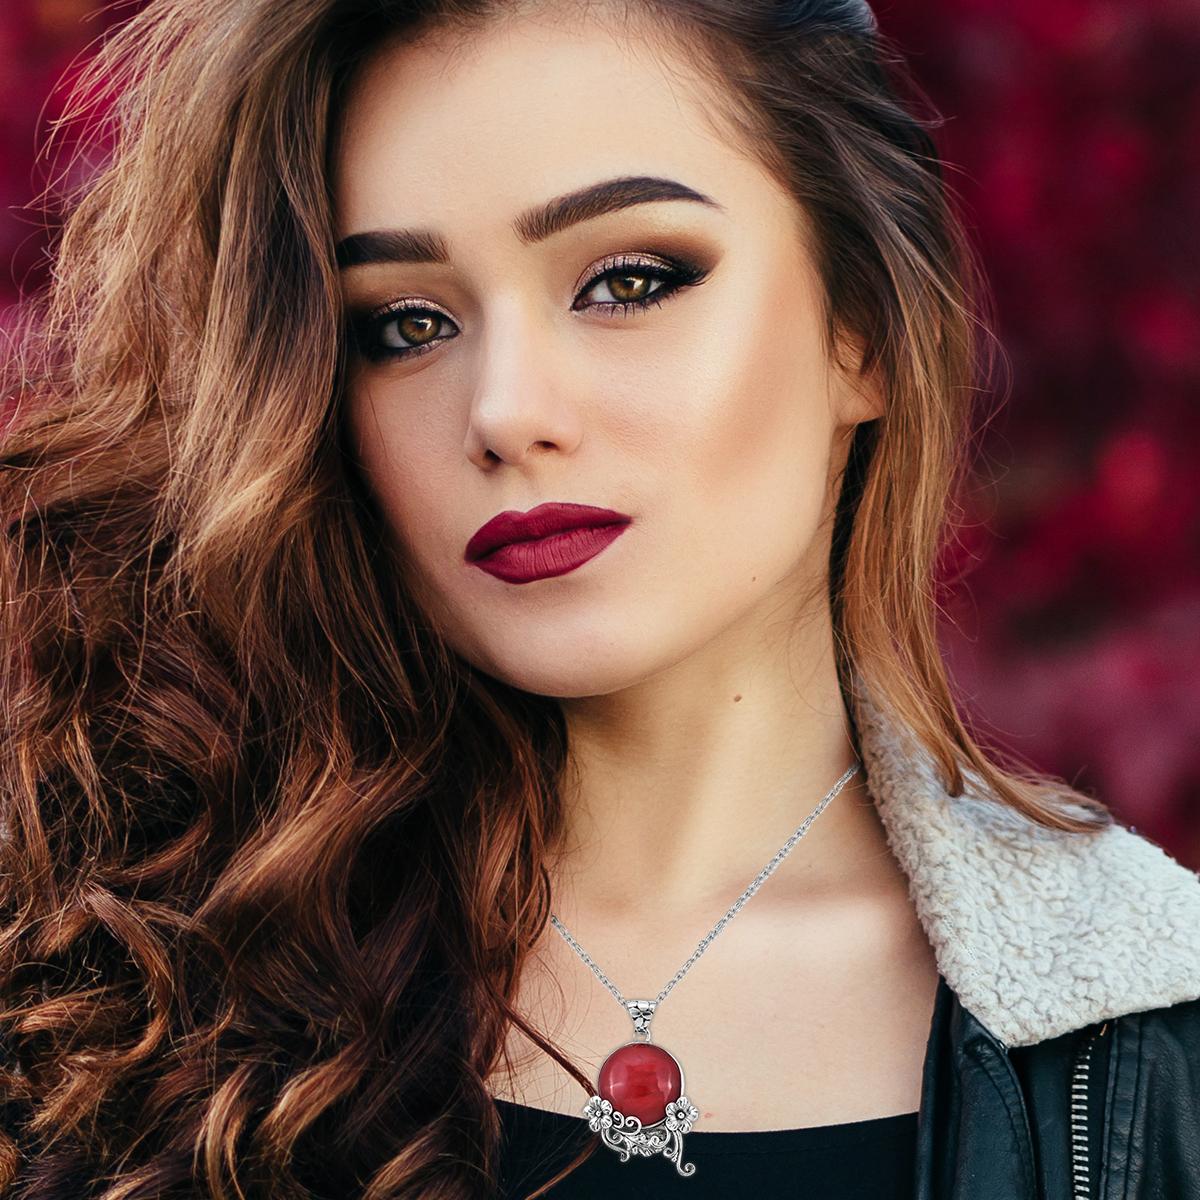 925 Sterling Silver Sponge Coral Elegant Fashion Pendant Jewelry Gift for Women